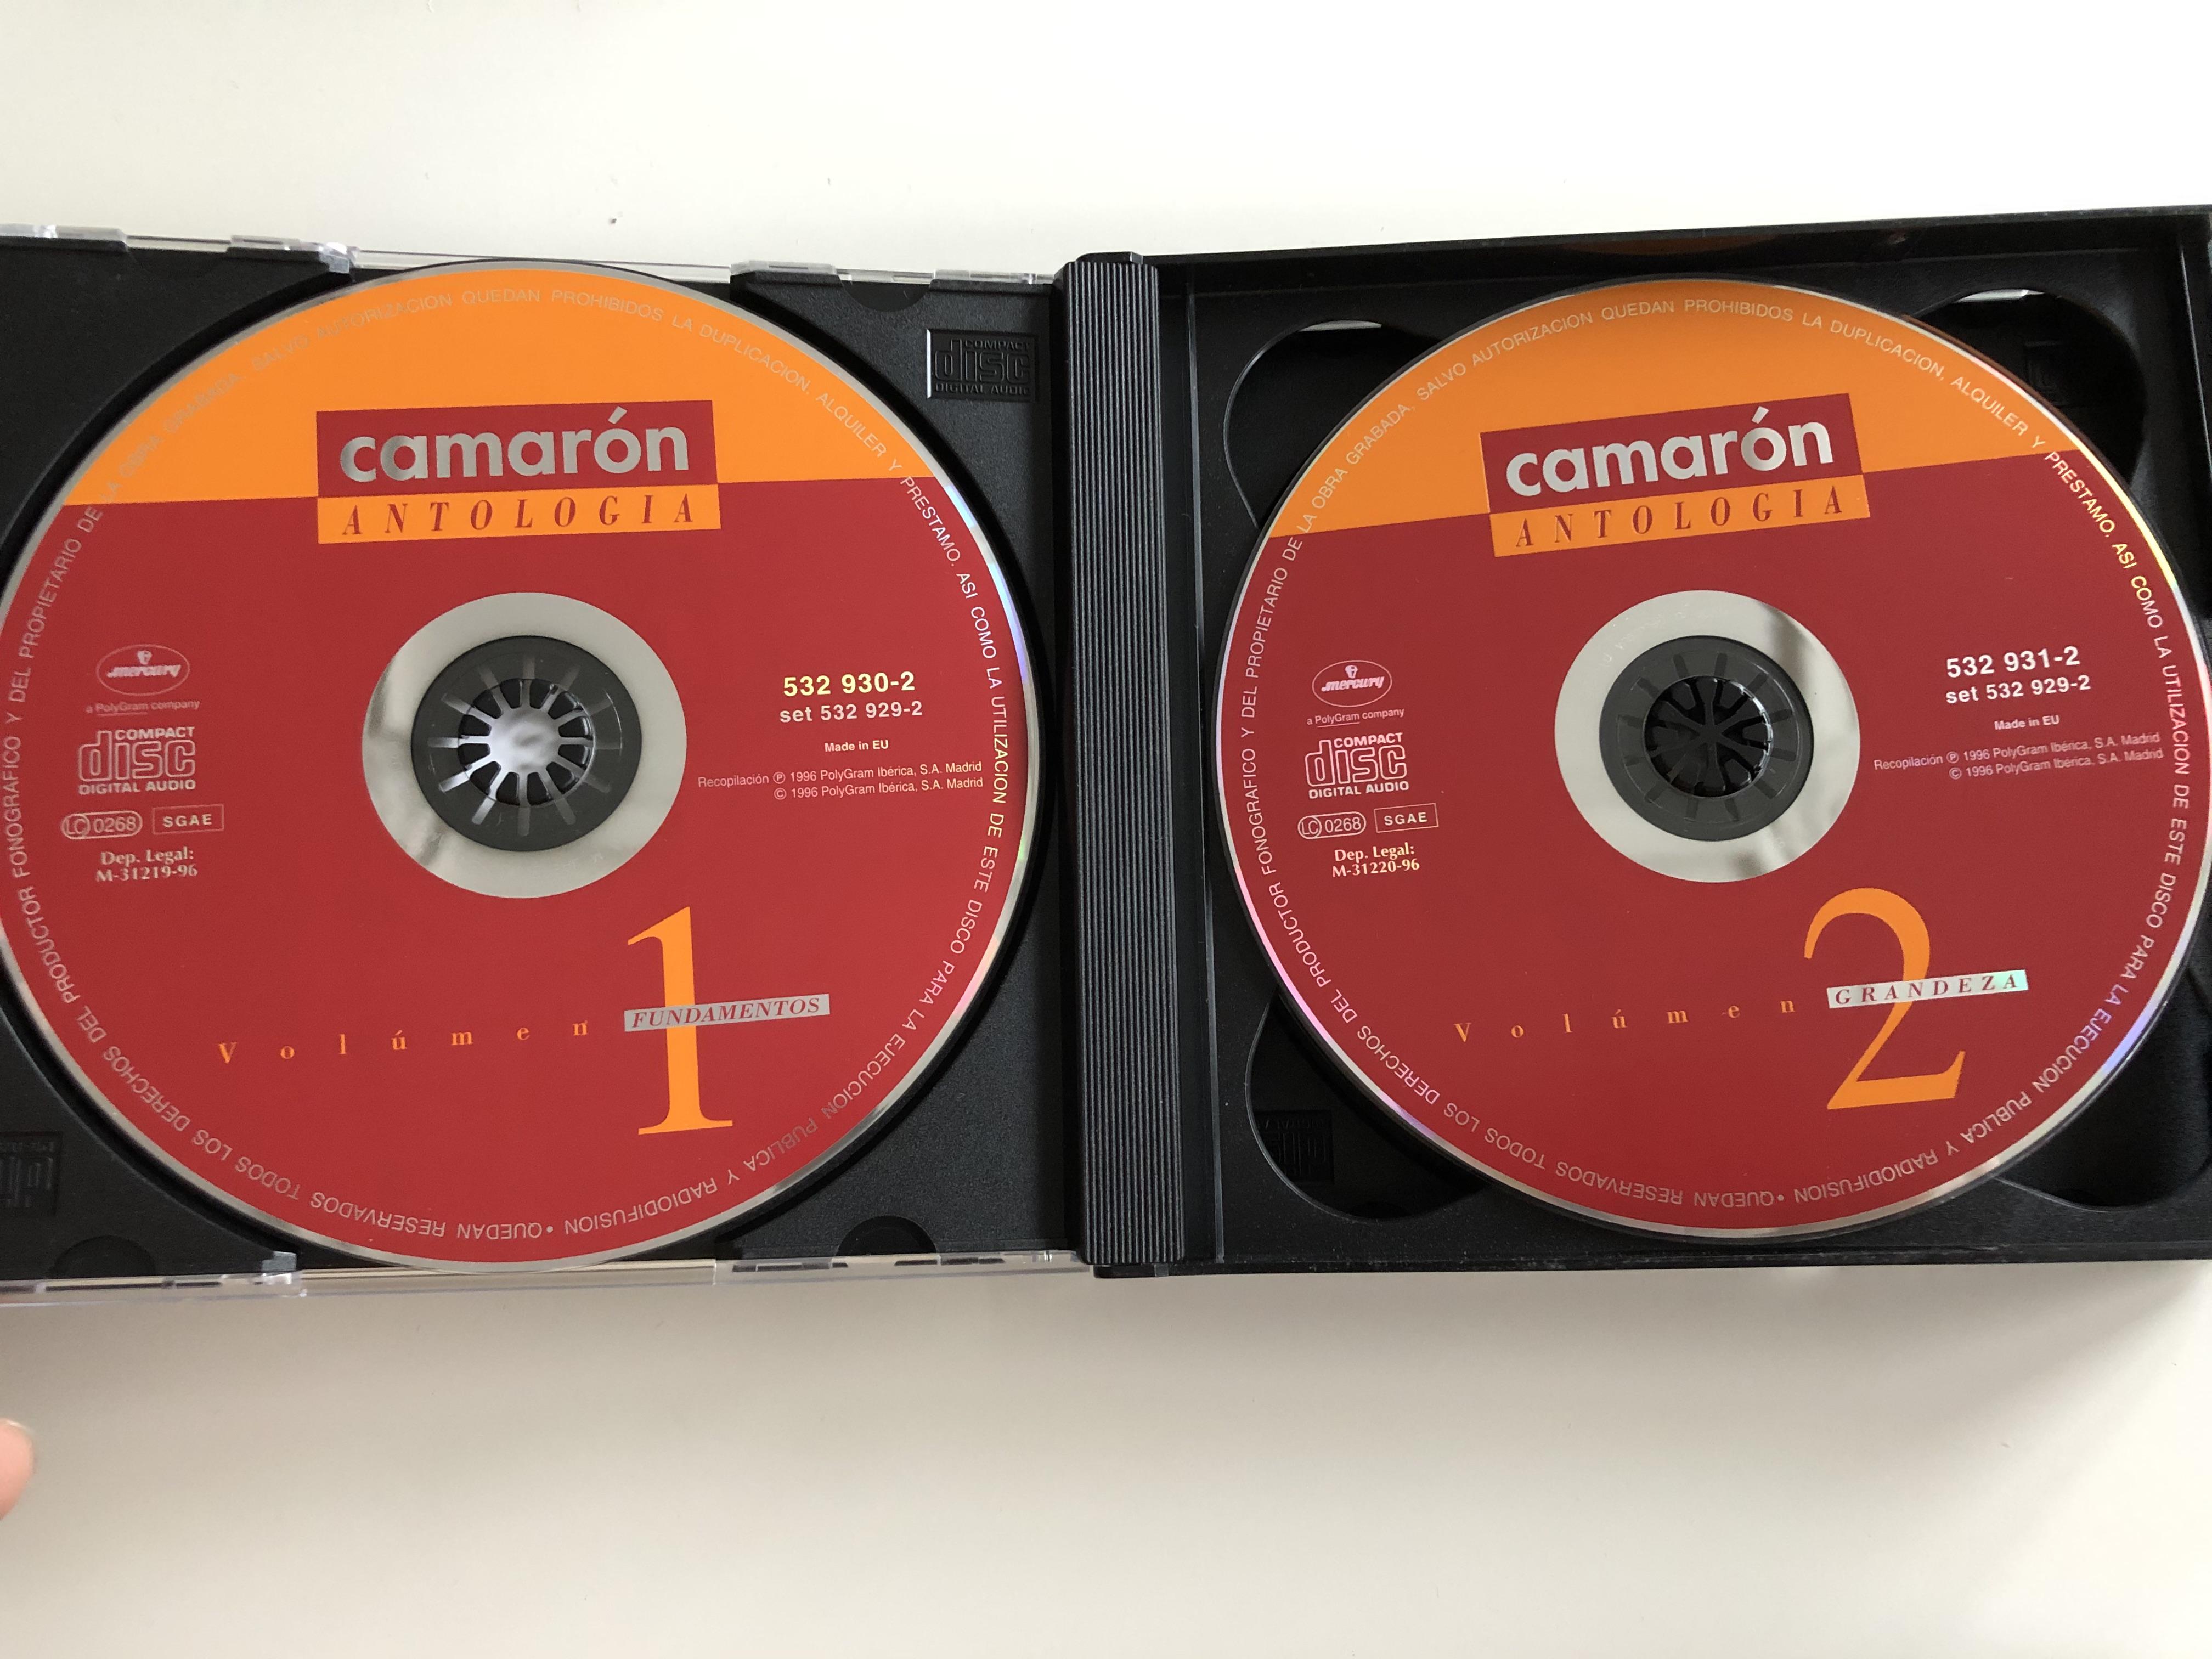 camar-n-antologia-anthology-3-audio-cd-set-1996-vol-1-3.-fundamentos-grandeza-apoetosis-polygram-2-.jpg